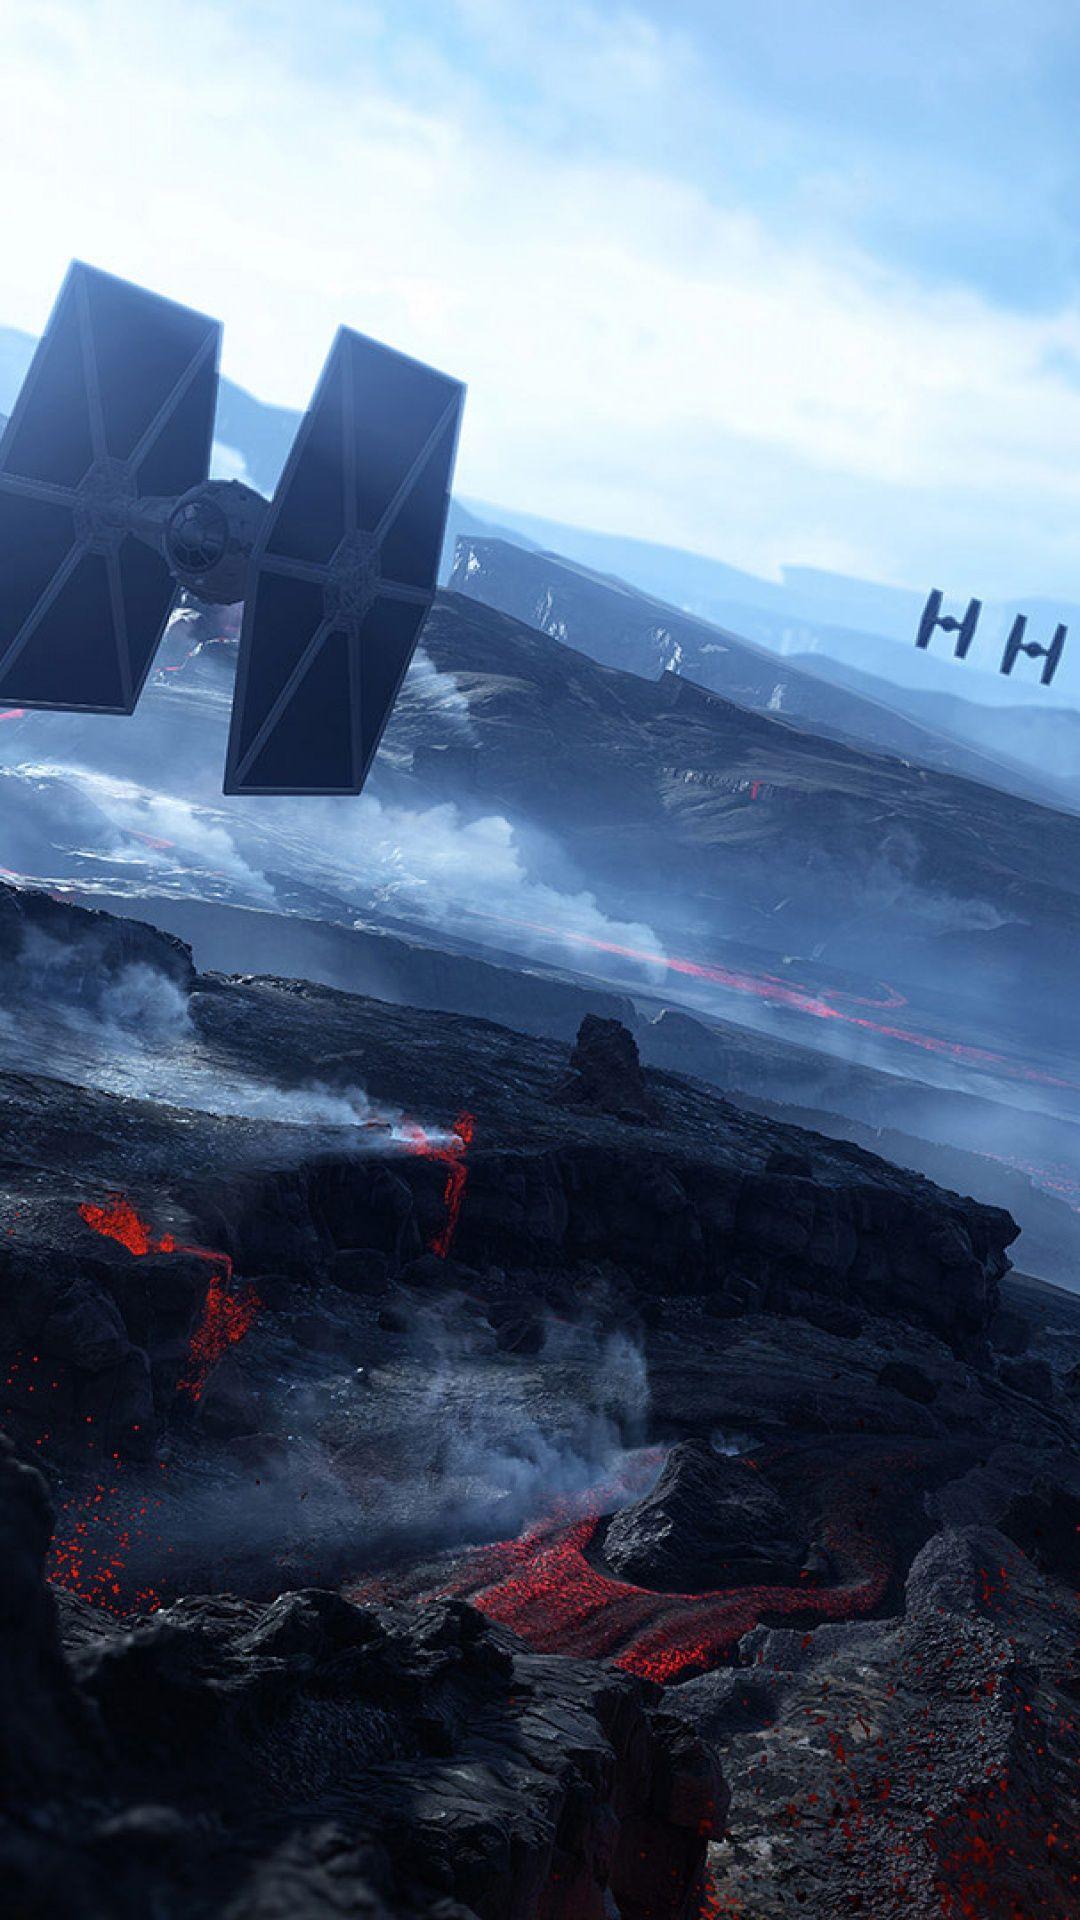 Star Wars HD Phone Wallpapers - Top Free Star Wars HD ...